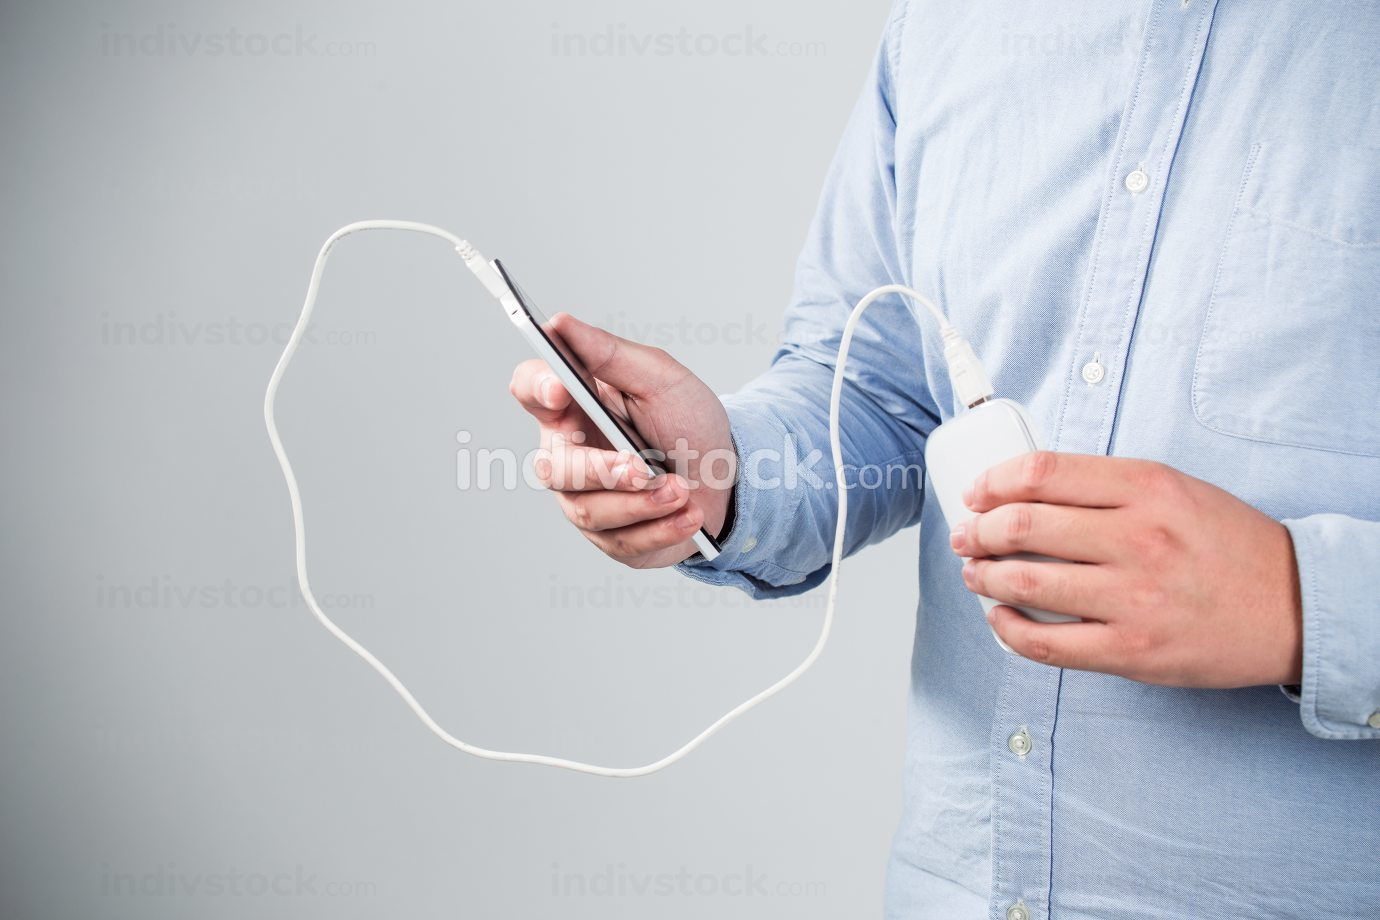 man is charging smartphone